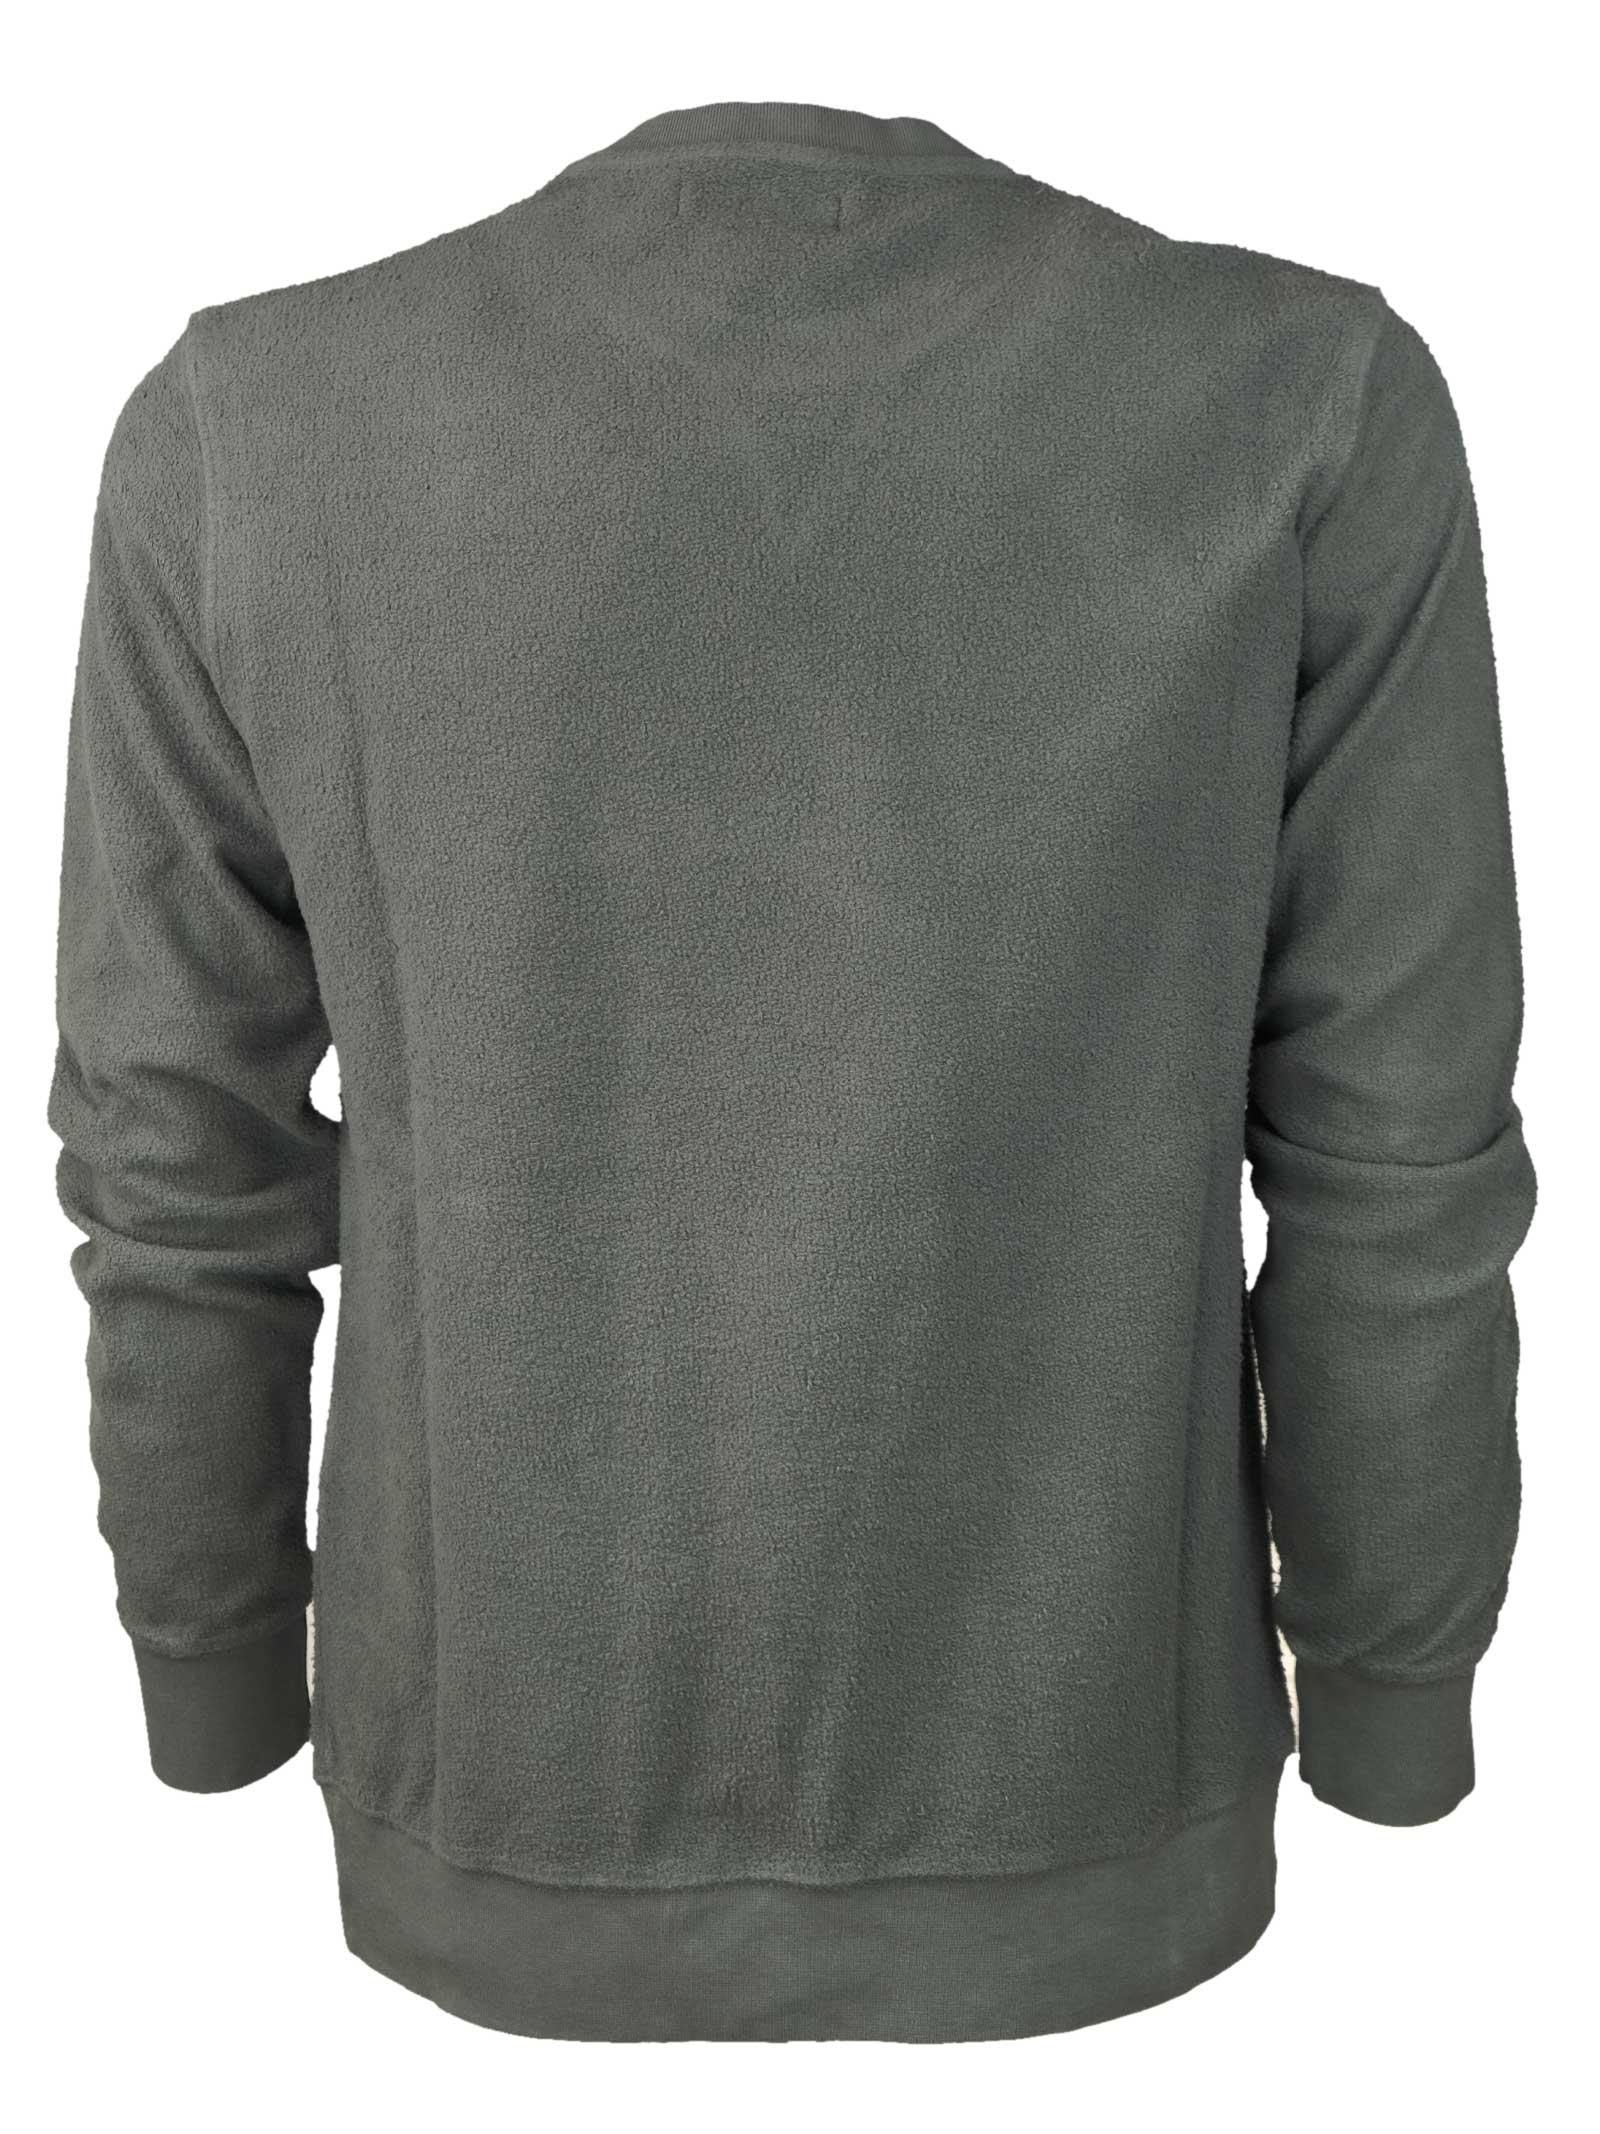 crew neck sweat shirt WOOL & CO. | Sweats | 822514